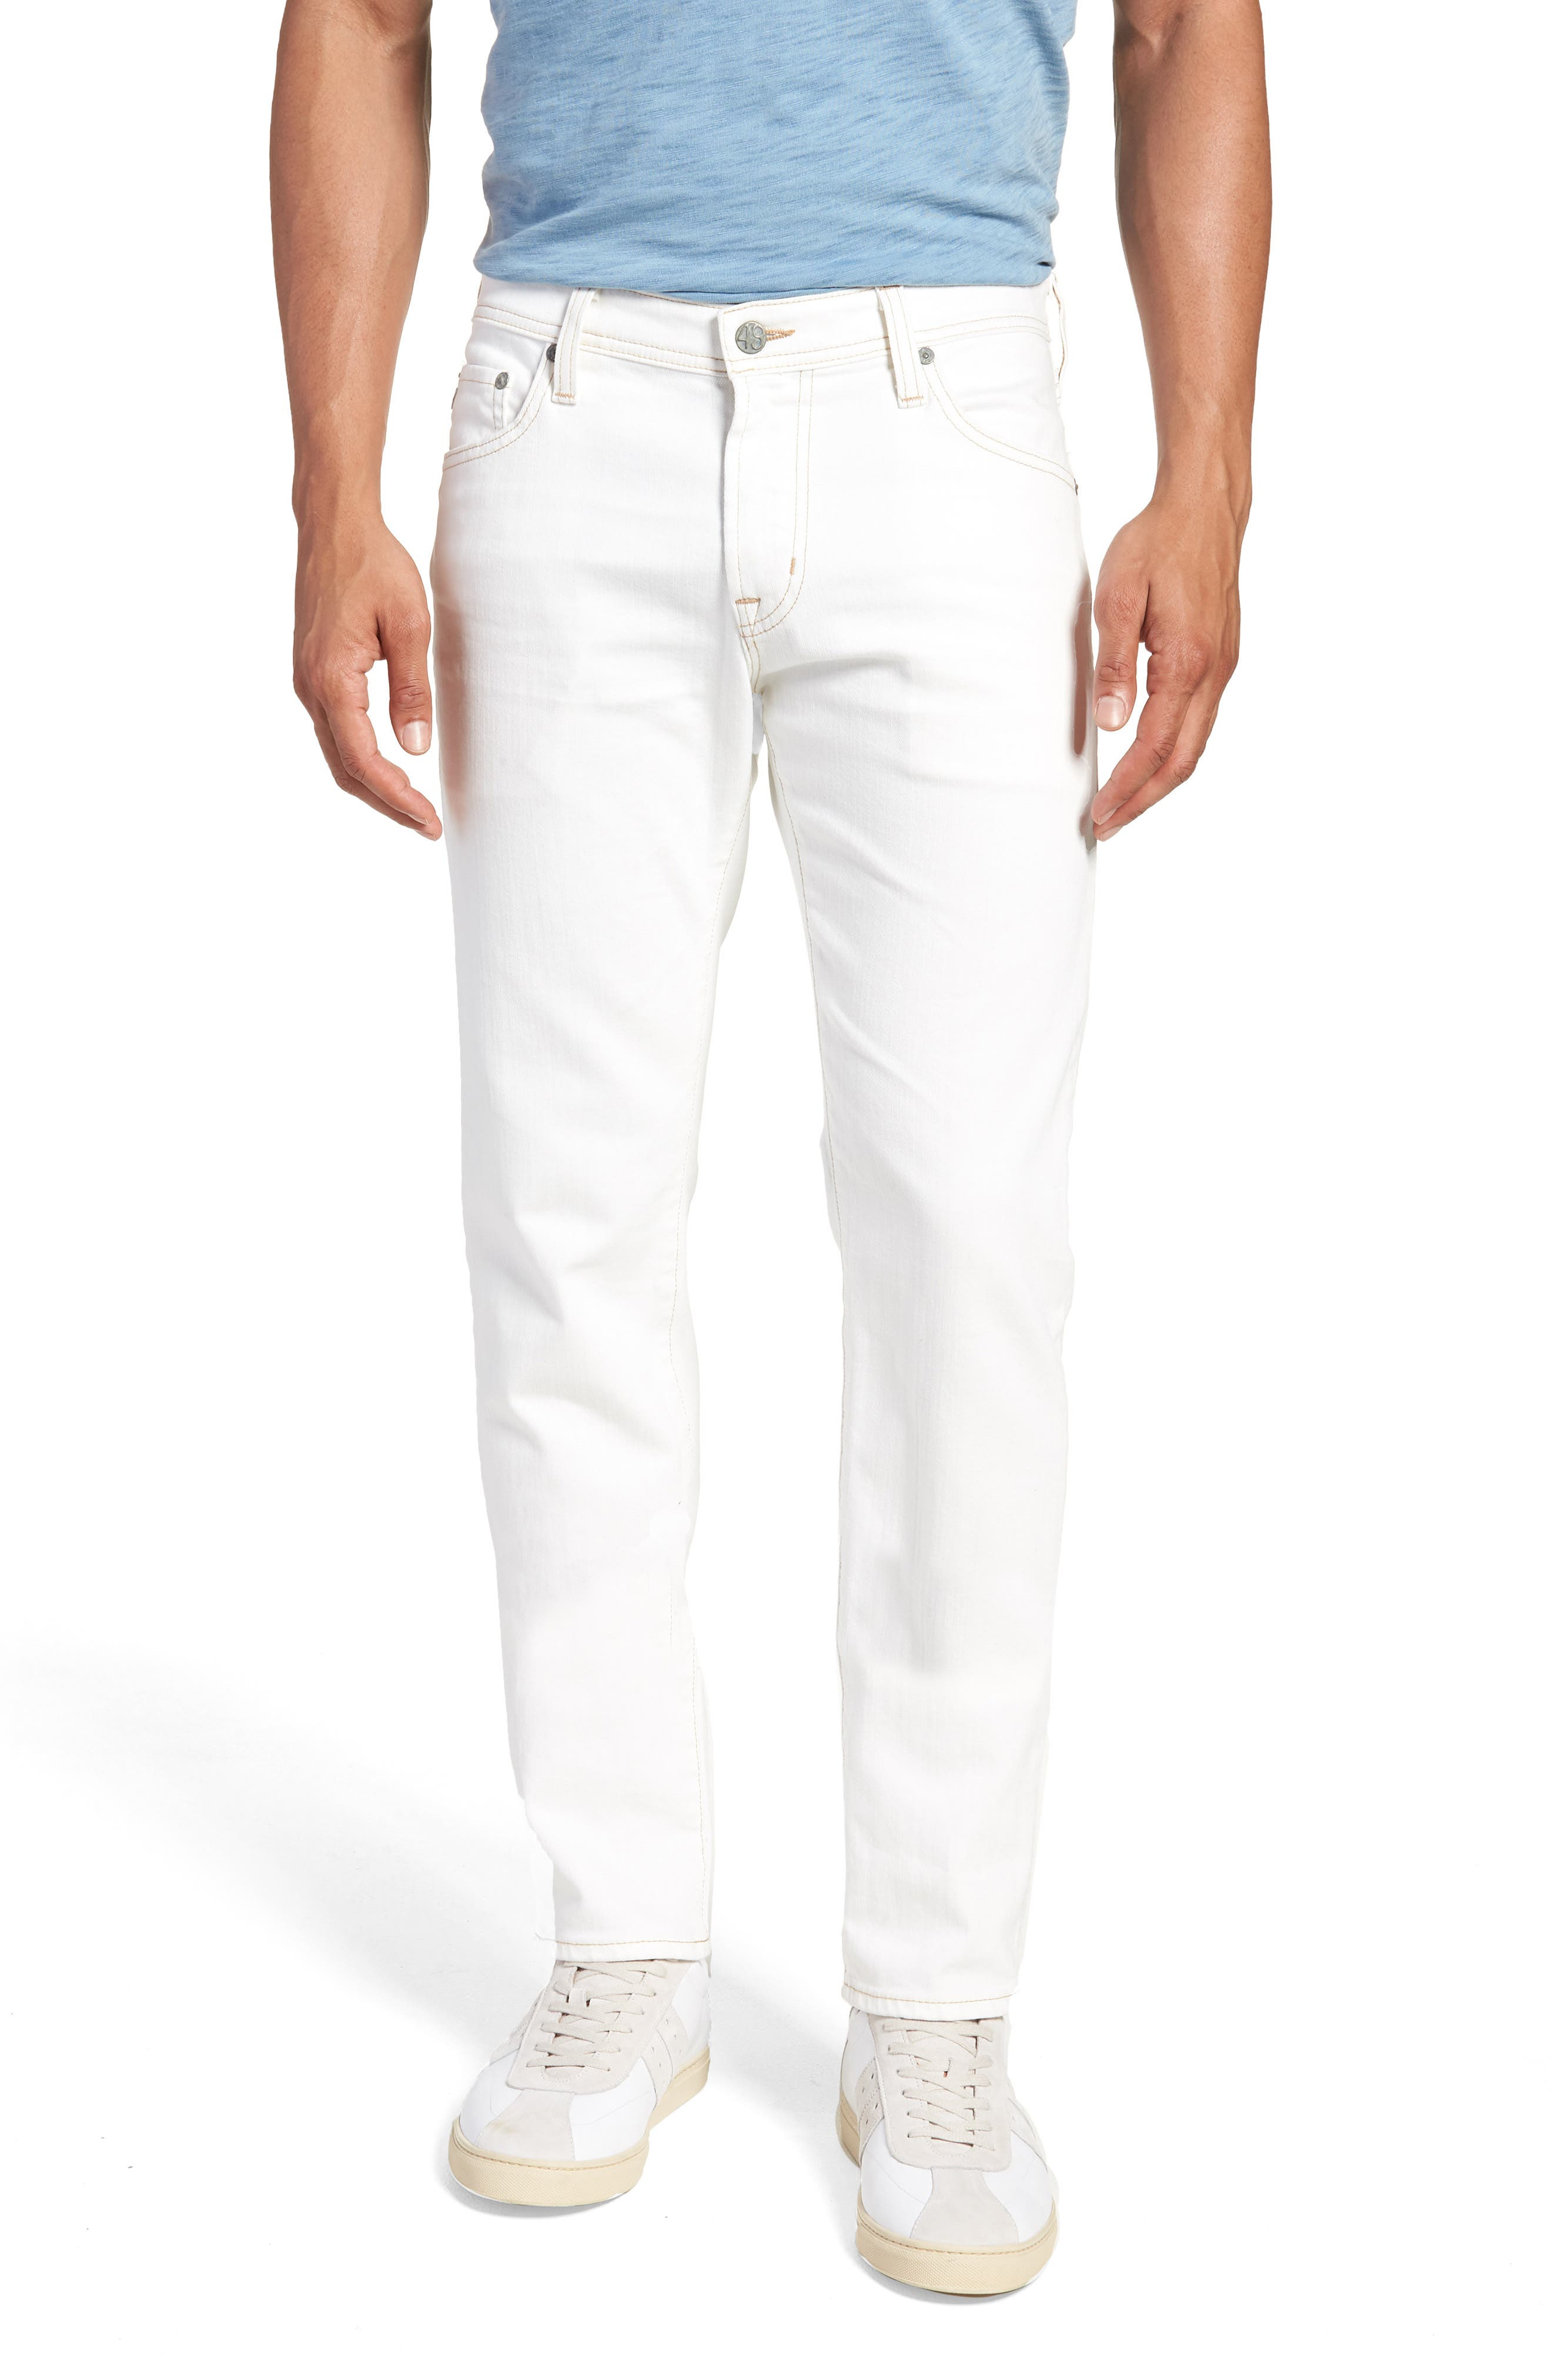 Tellis Slim Fit Jeans,                             Main thumbnail 1, color,                             1 YEAR NEUTRAL WHITE